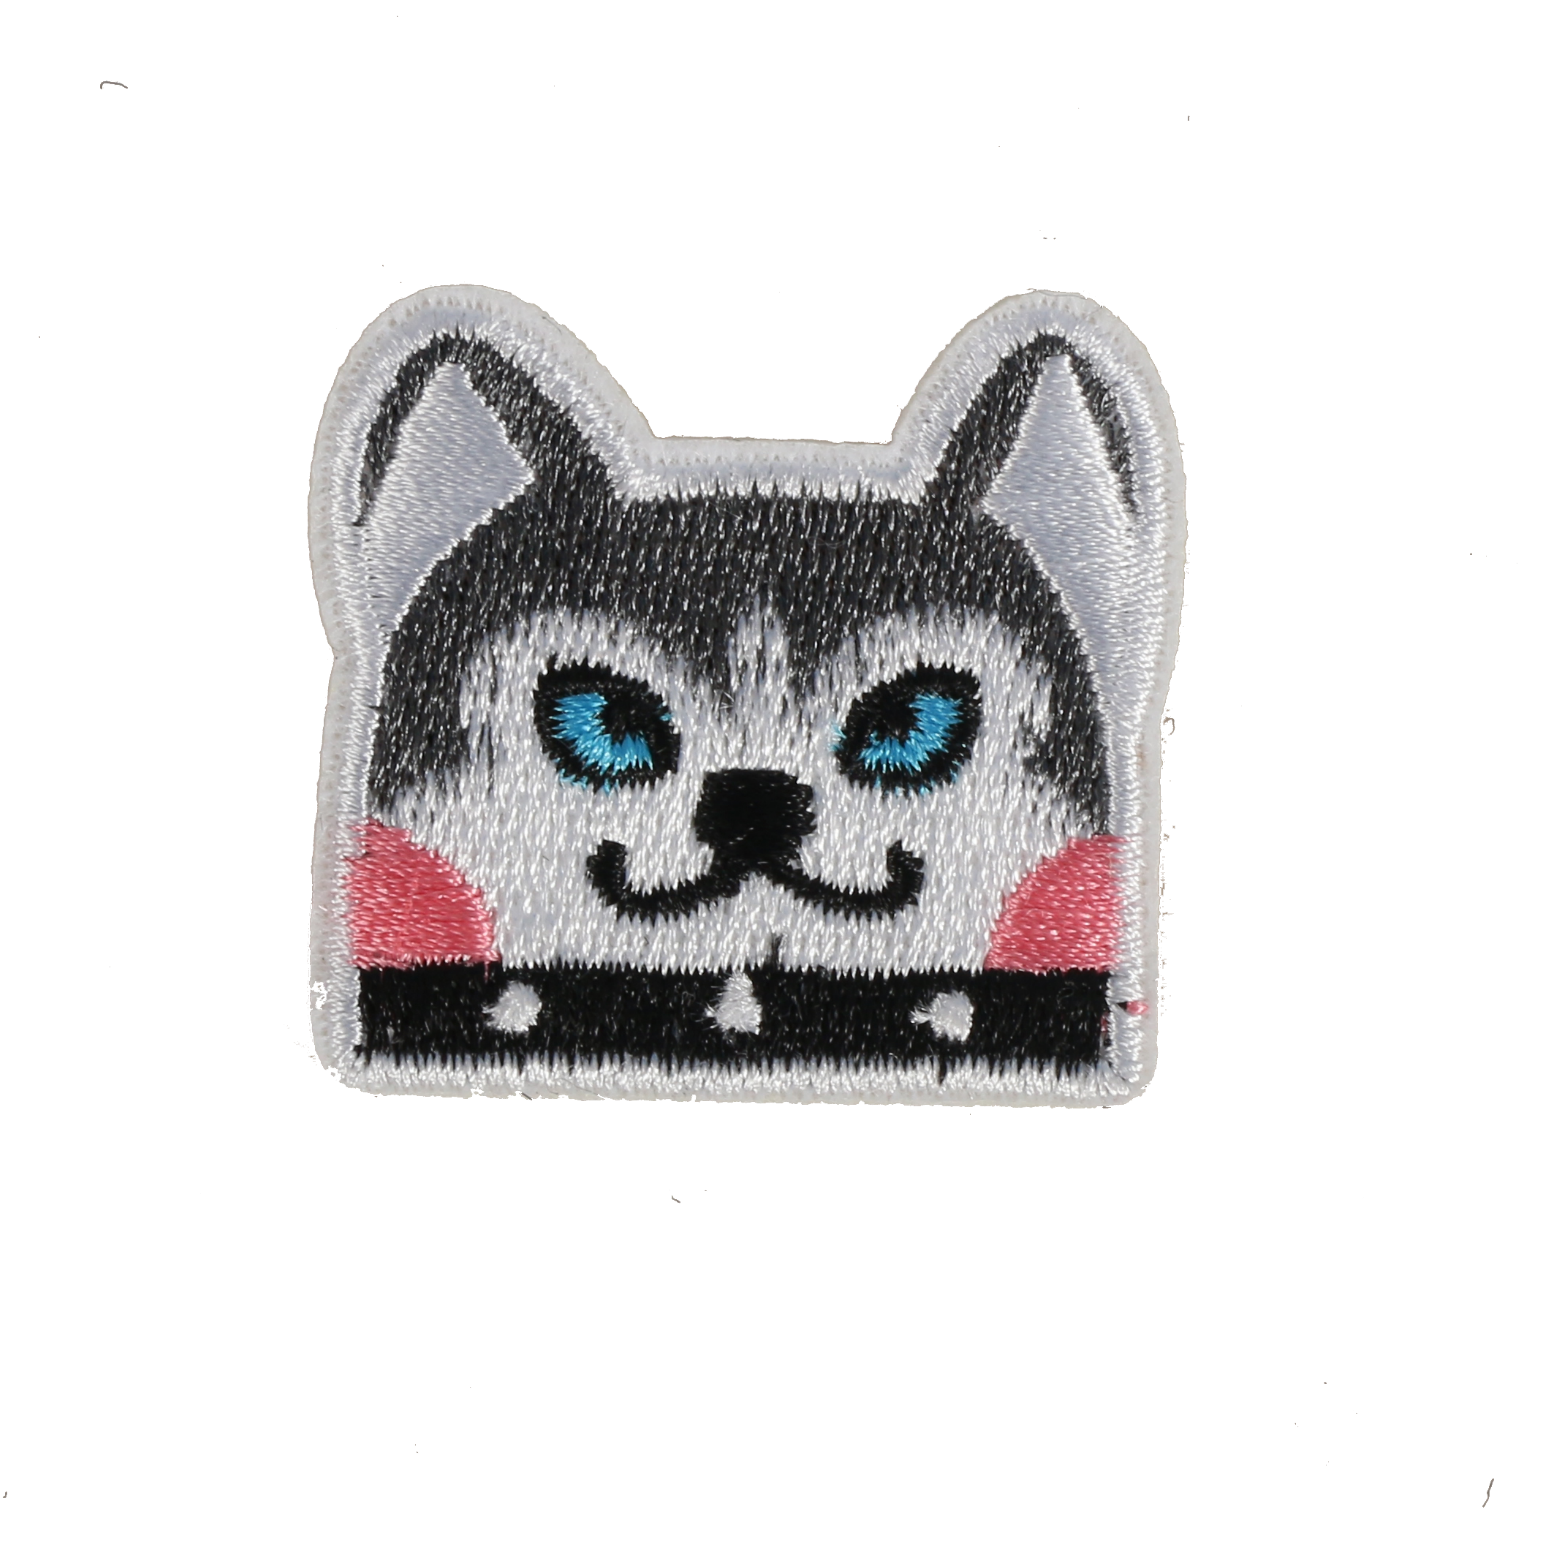 S0093 Siberian Husky Dog 4.2x4cm